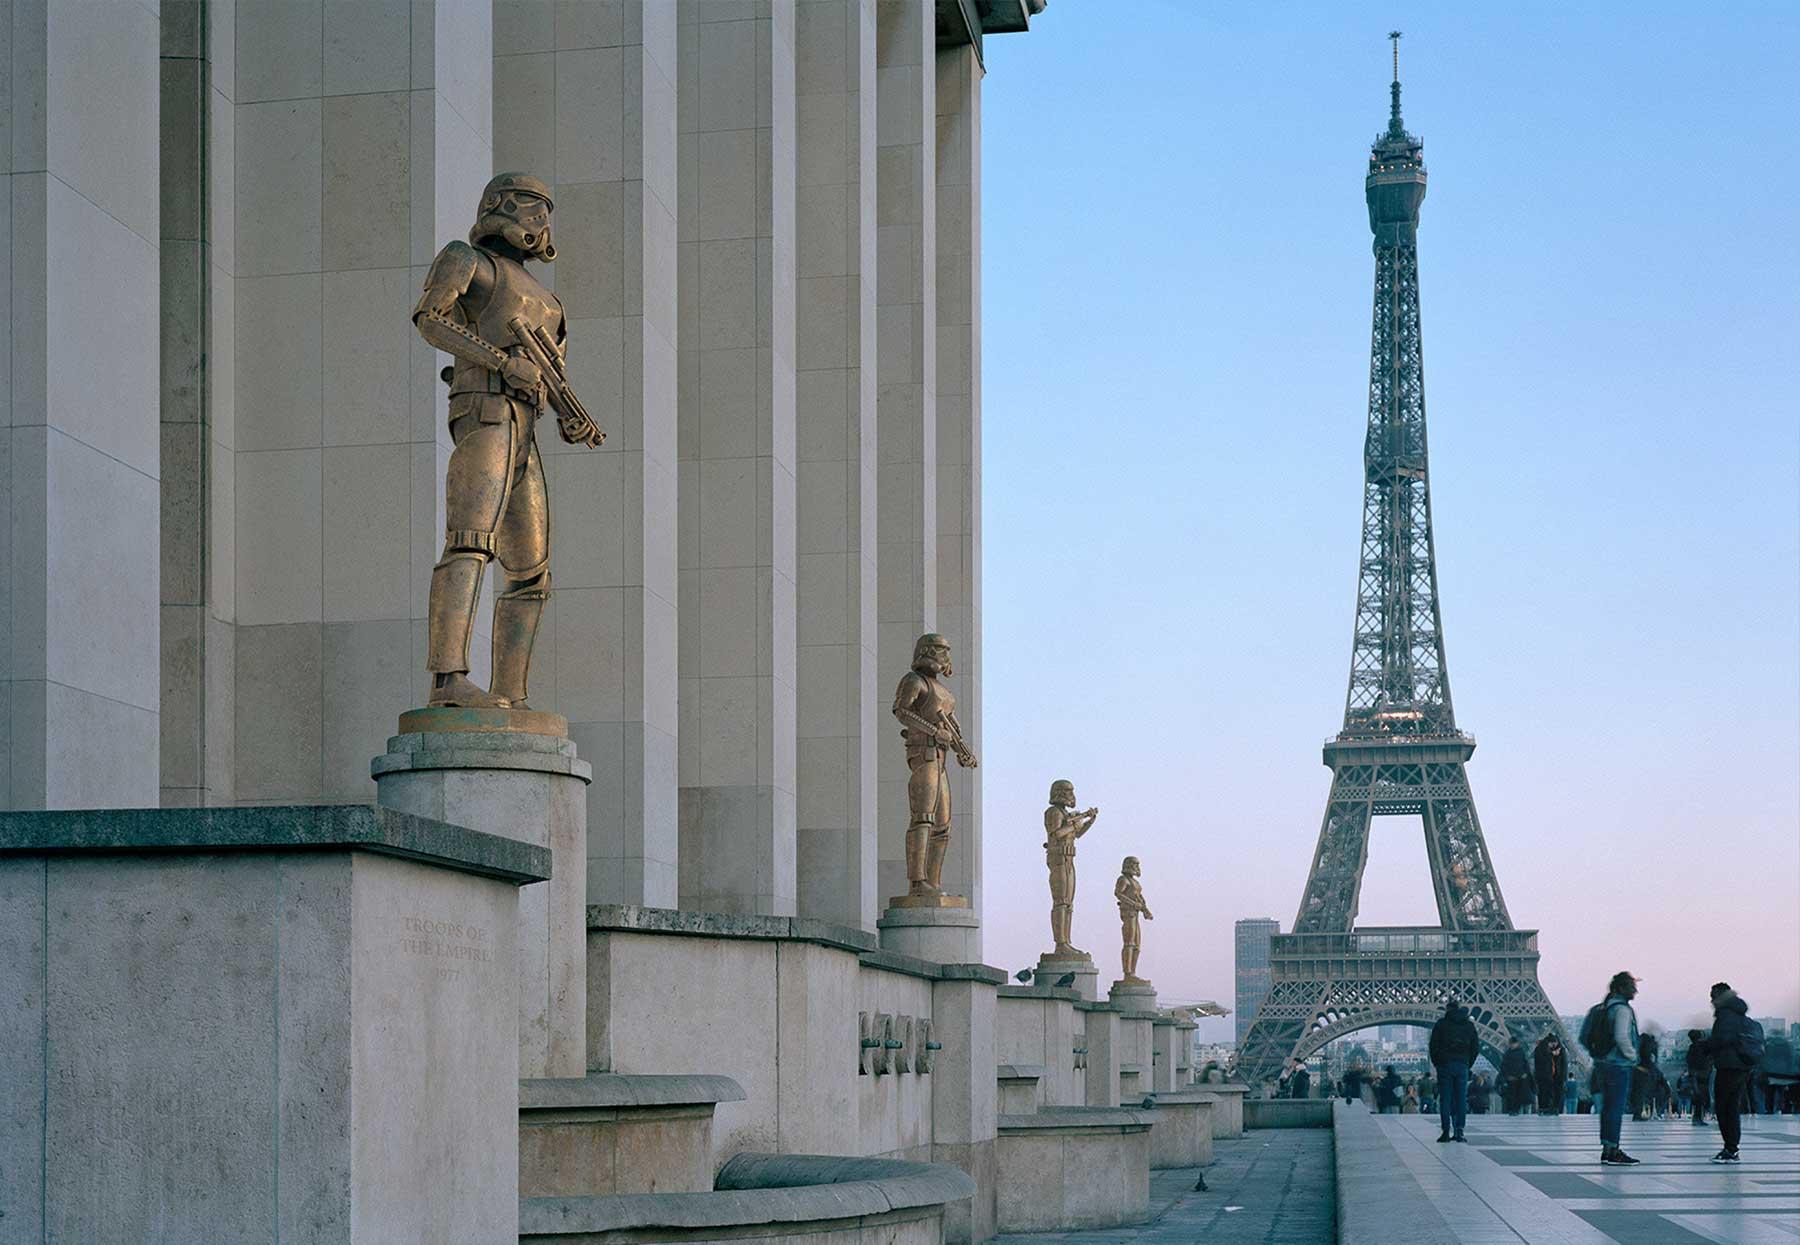 Popkulturen-Statuen Monuments_Benoit-Lapray_05